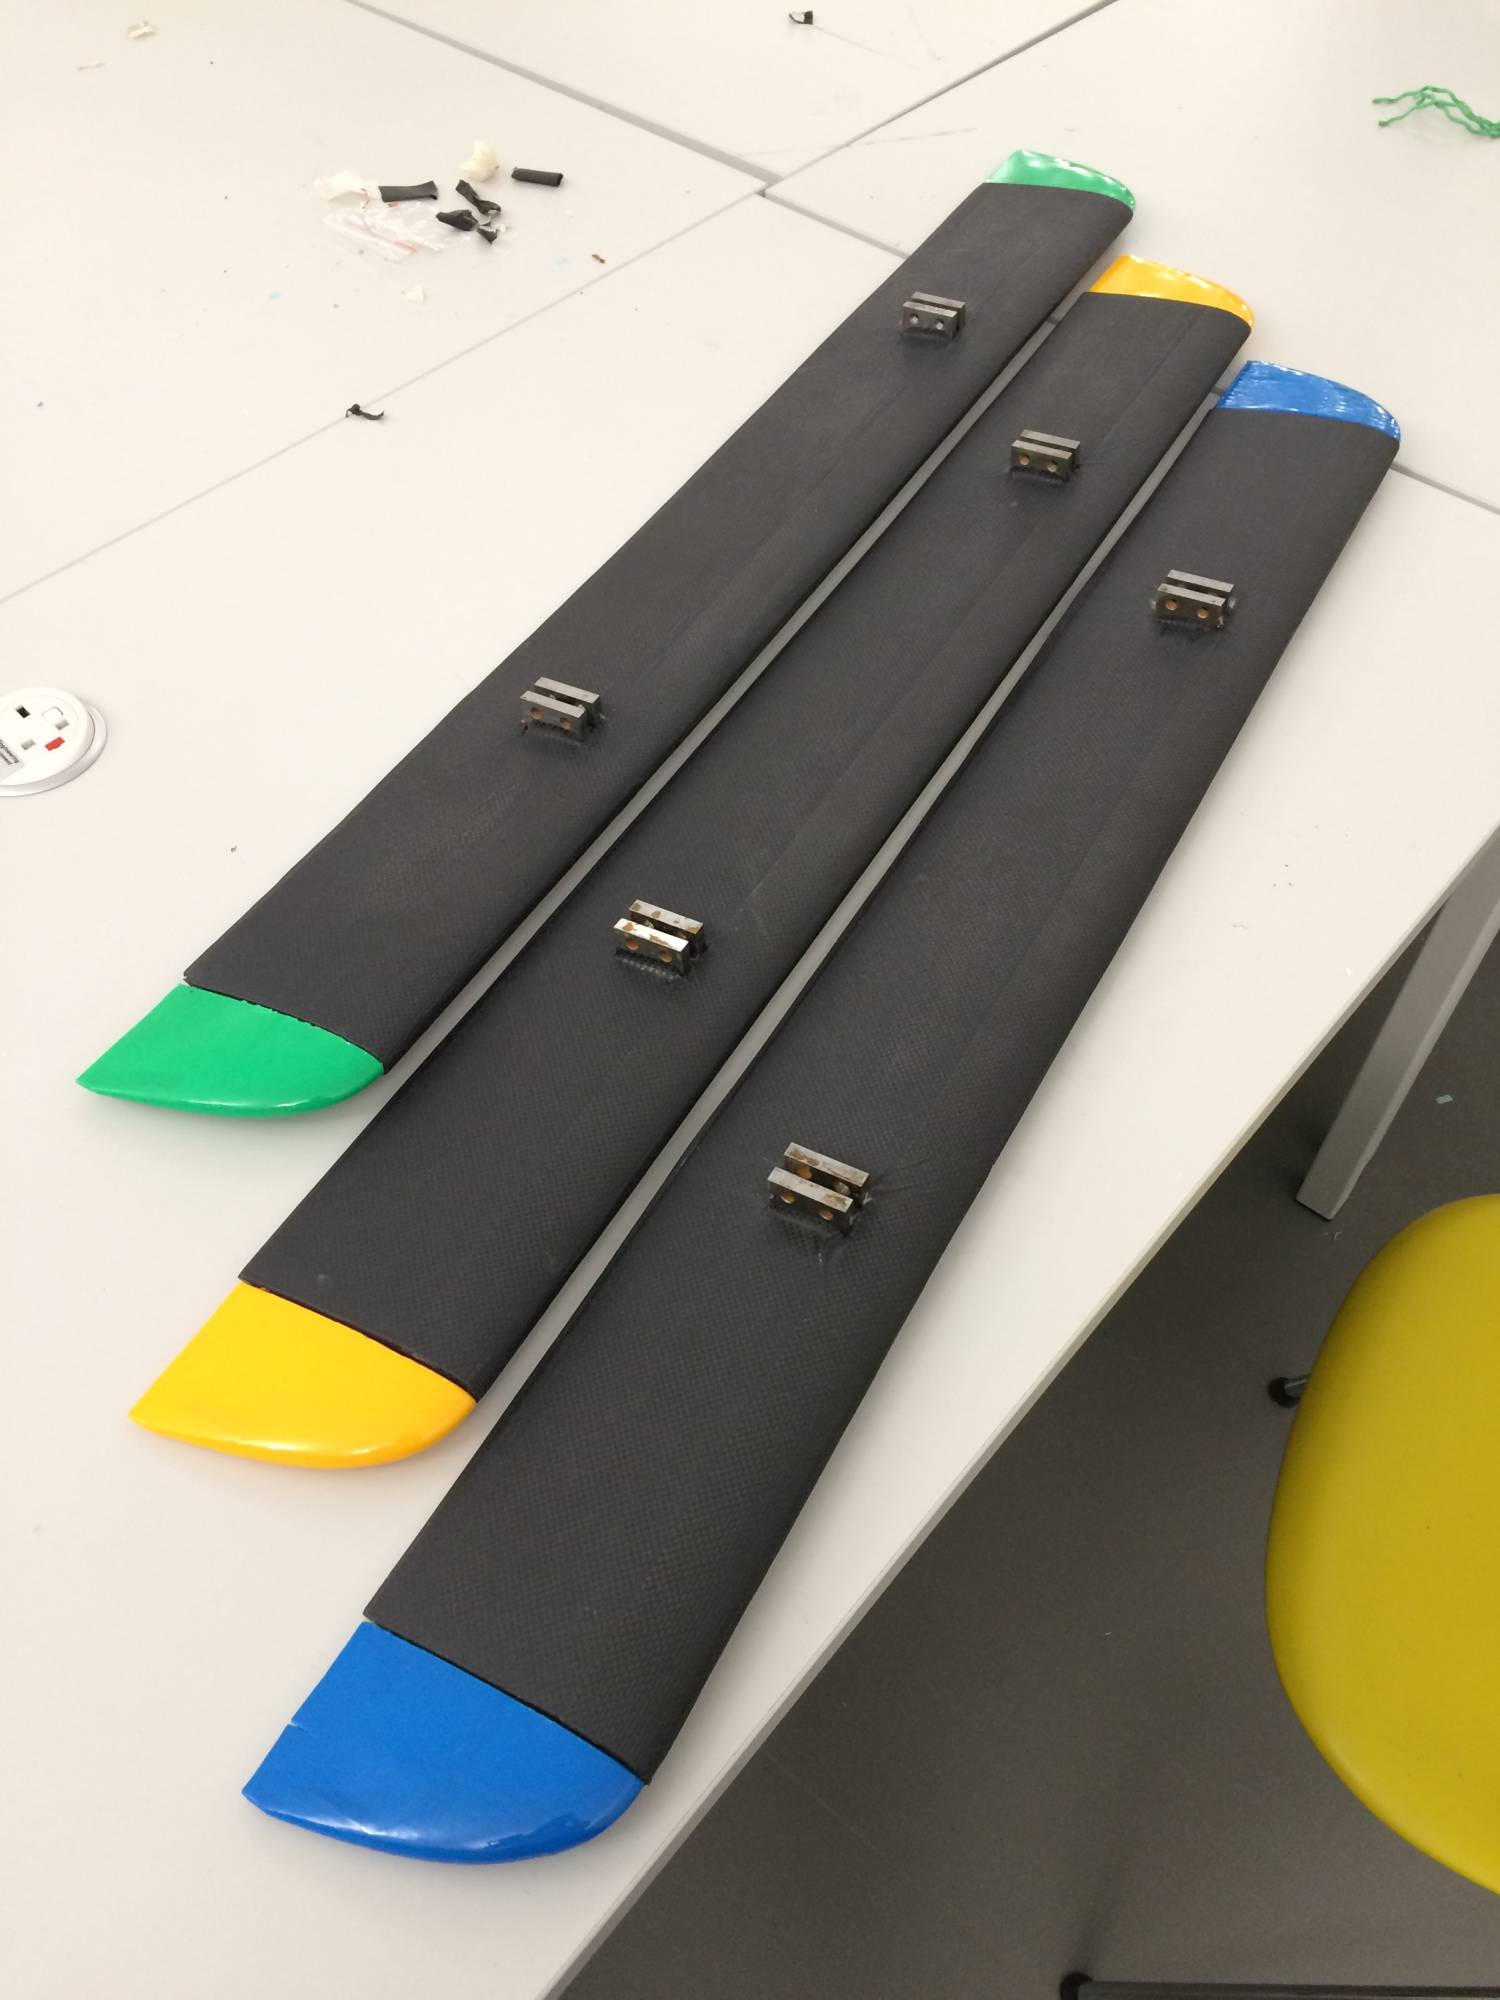 Vertical Axis Wind Turbine | Design Show 2016